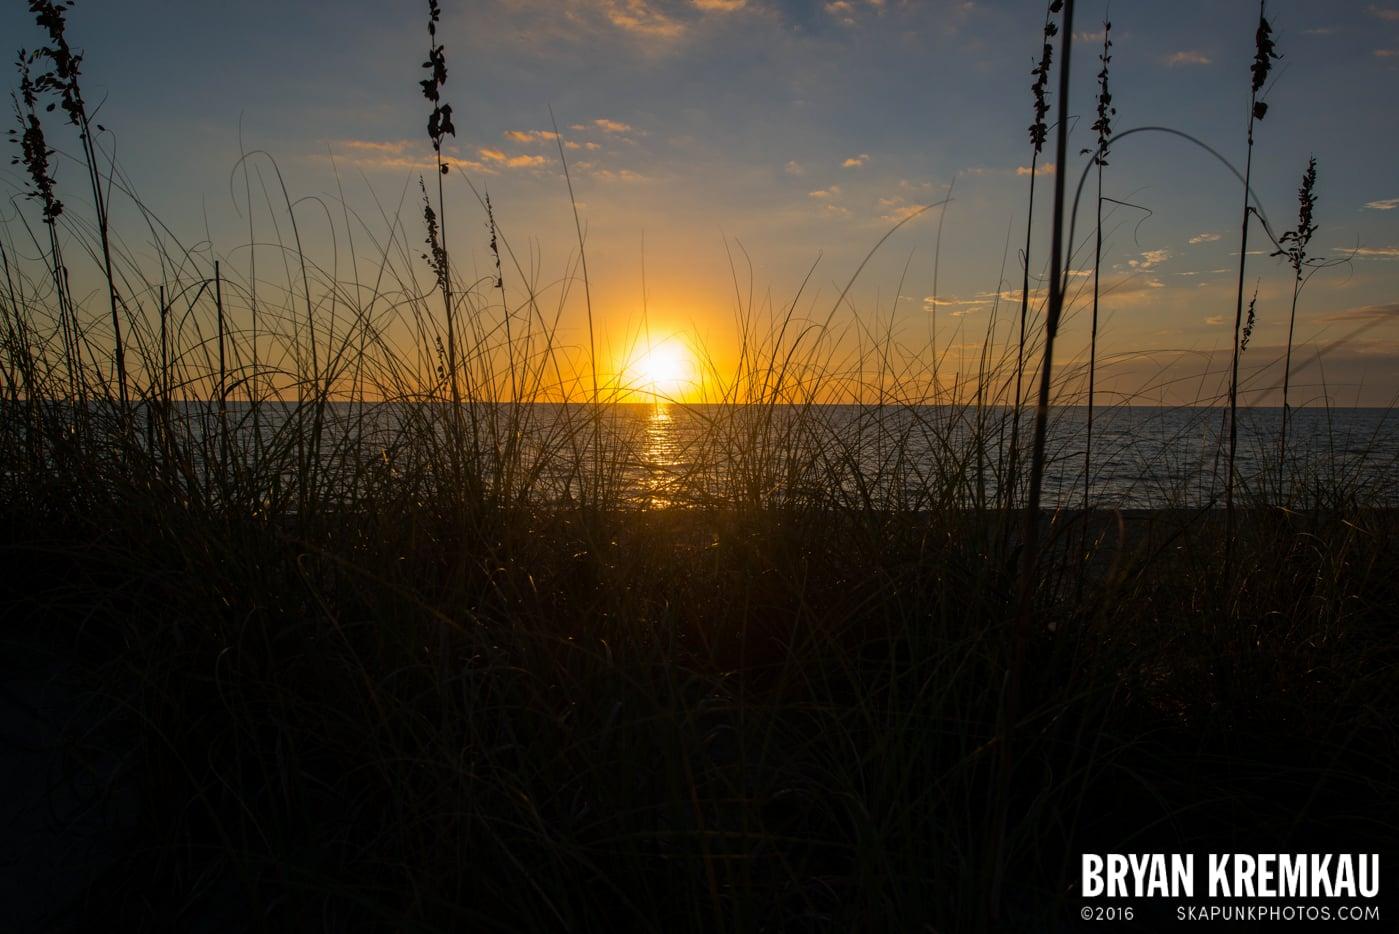 Sunsets, Astrophotography & Birds @ Venice, Florida - 10.25.14 - 11.5.14 (119)